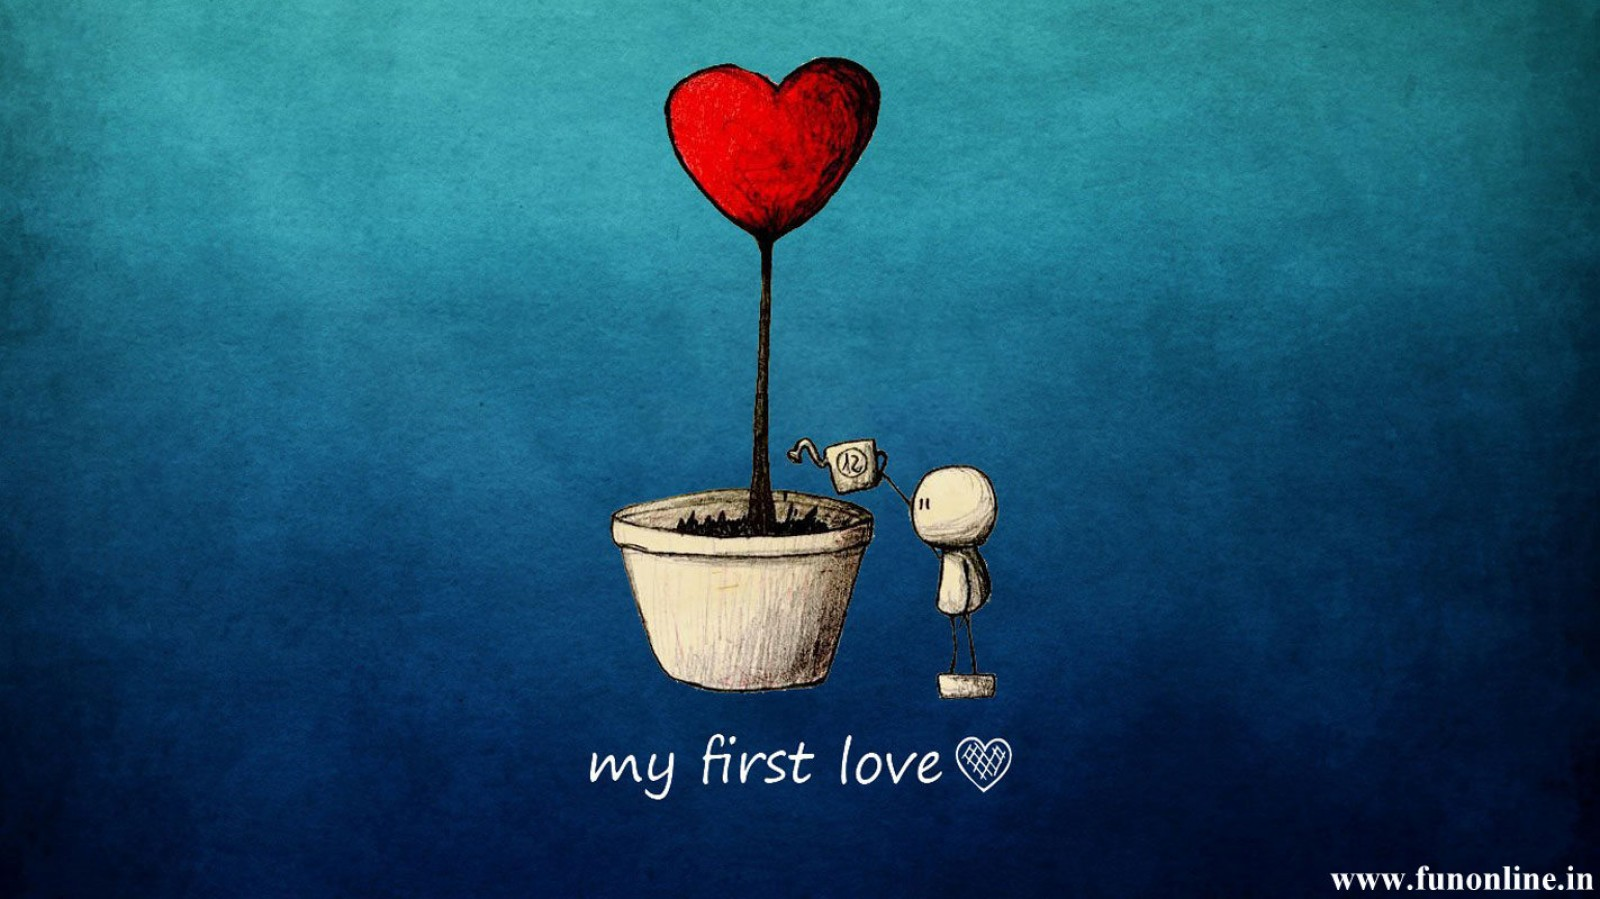 Download My First Cute Love Wallpaper 1600x899 69 Cute Love